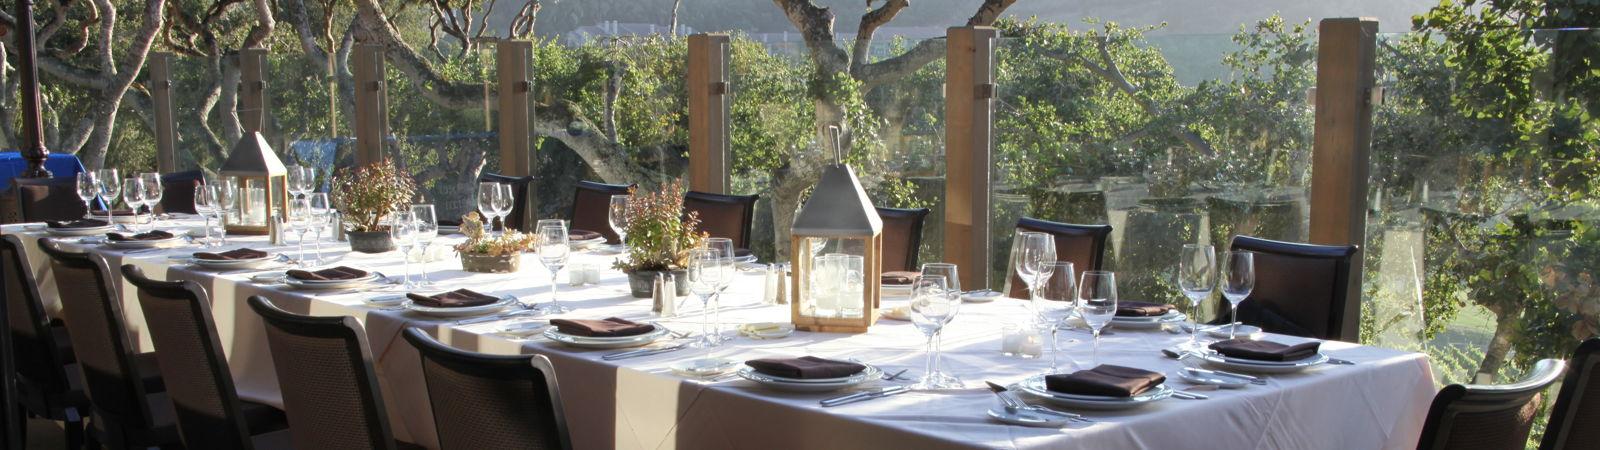 Carmel Valley Ranch_Events_Vintner Terrace kings table